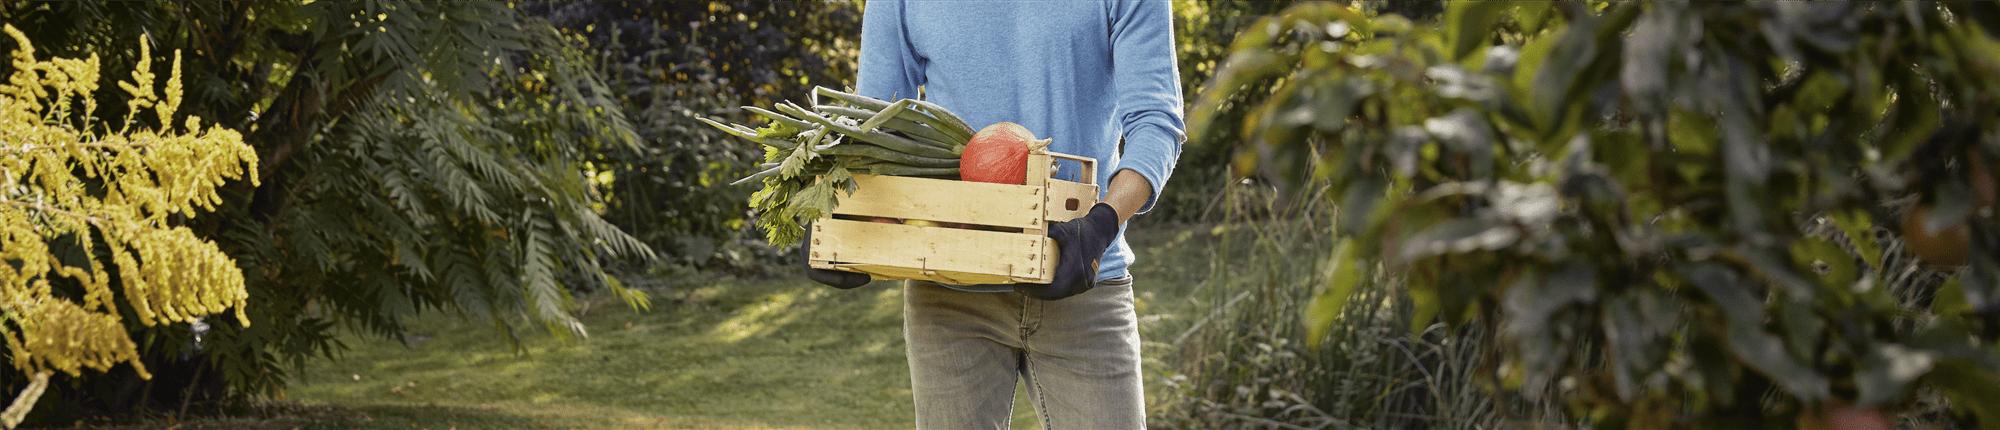 Que planter au balcon et au jardin en octobre ? - GARDENA